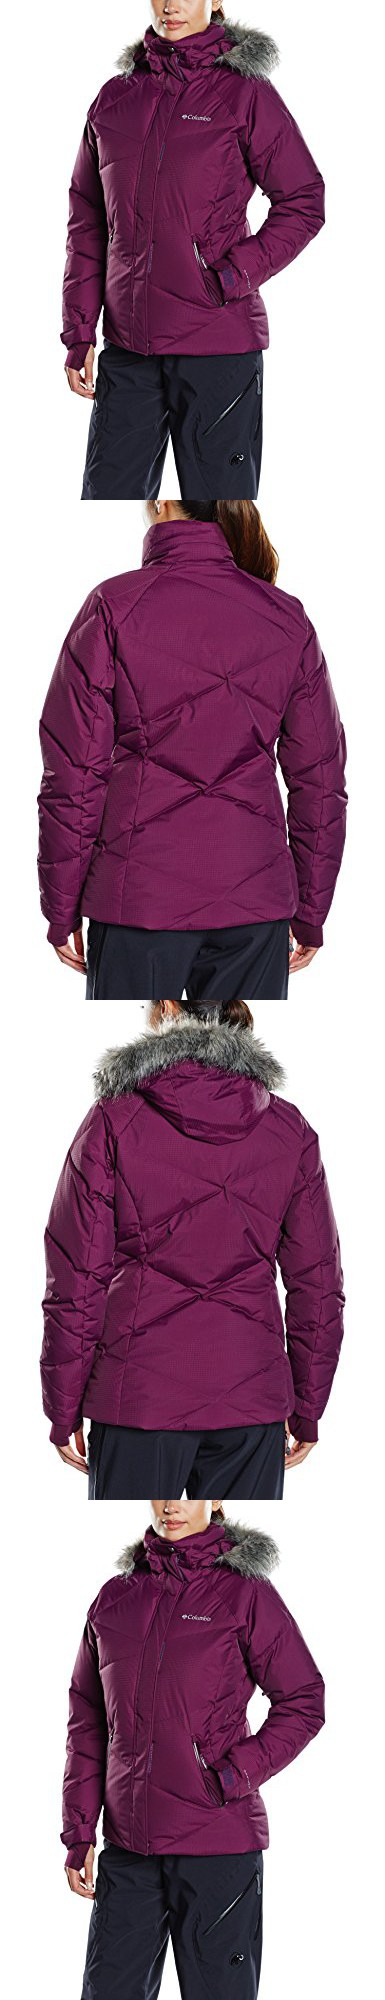 8ceb4cc4d Columbia Women's Lay D Down Jacket, Purple Dahlia Dobby, Medium ...